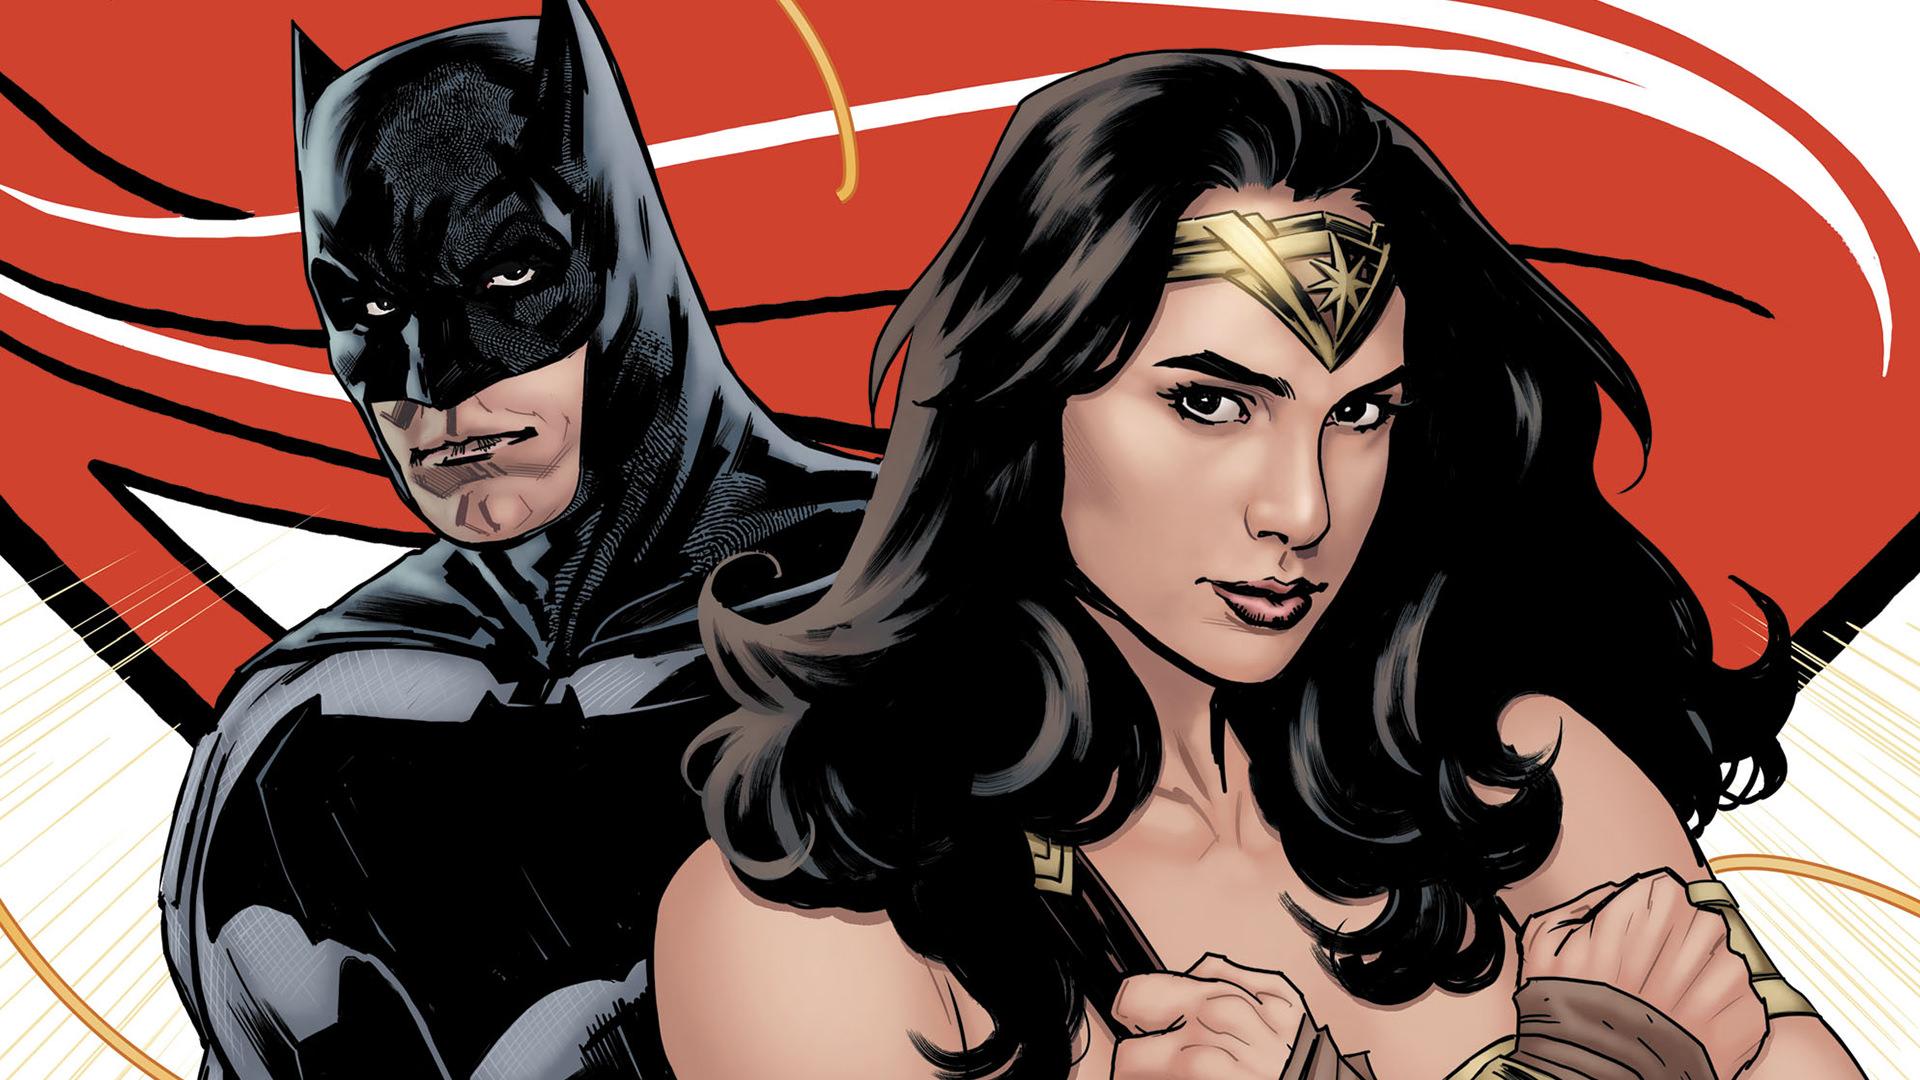 Batman And Wonder Woman Artwork, Hd Superheroes, 4K Wallpapers, Images, Backgrounds -9001